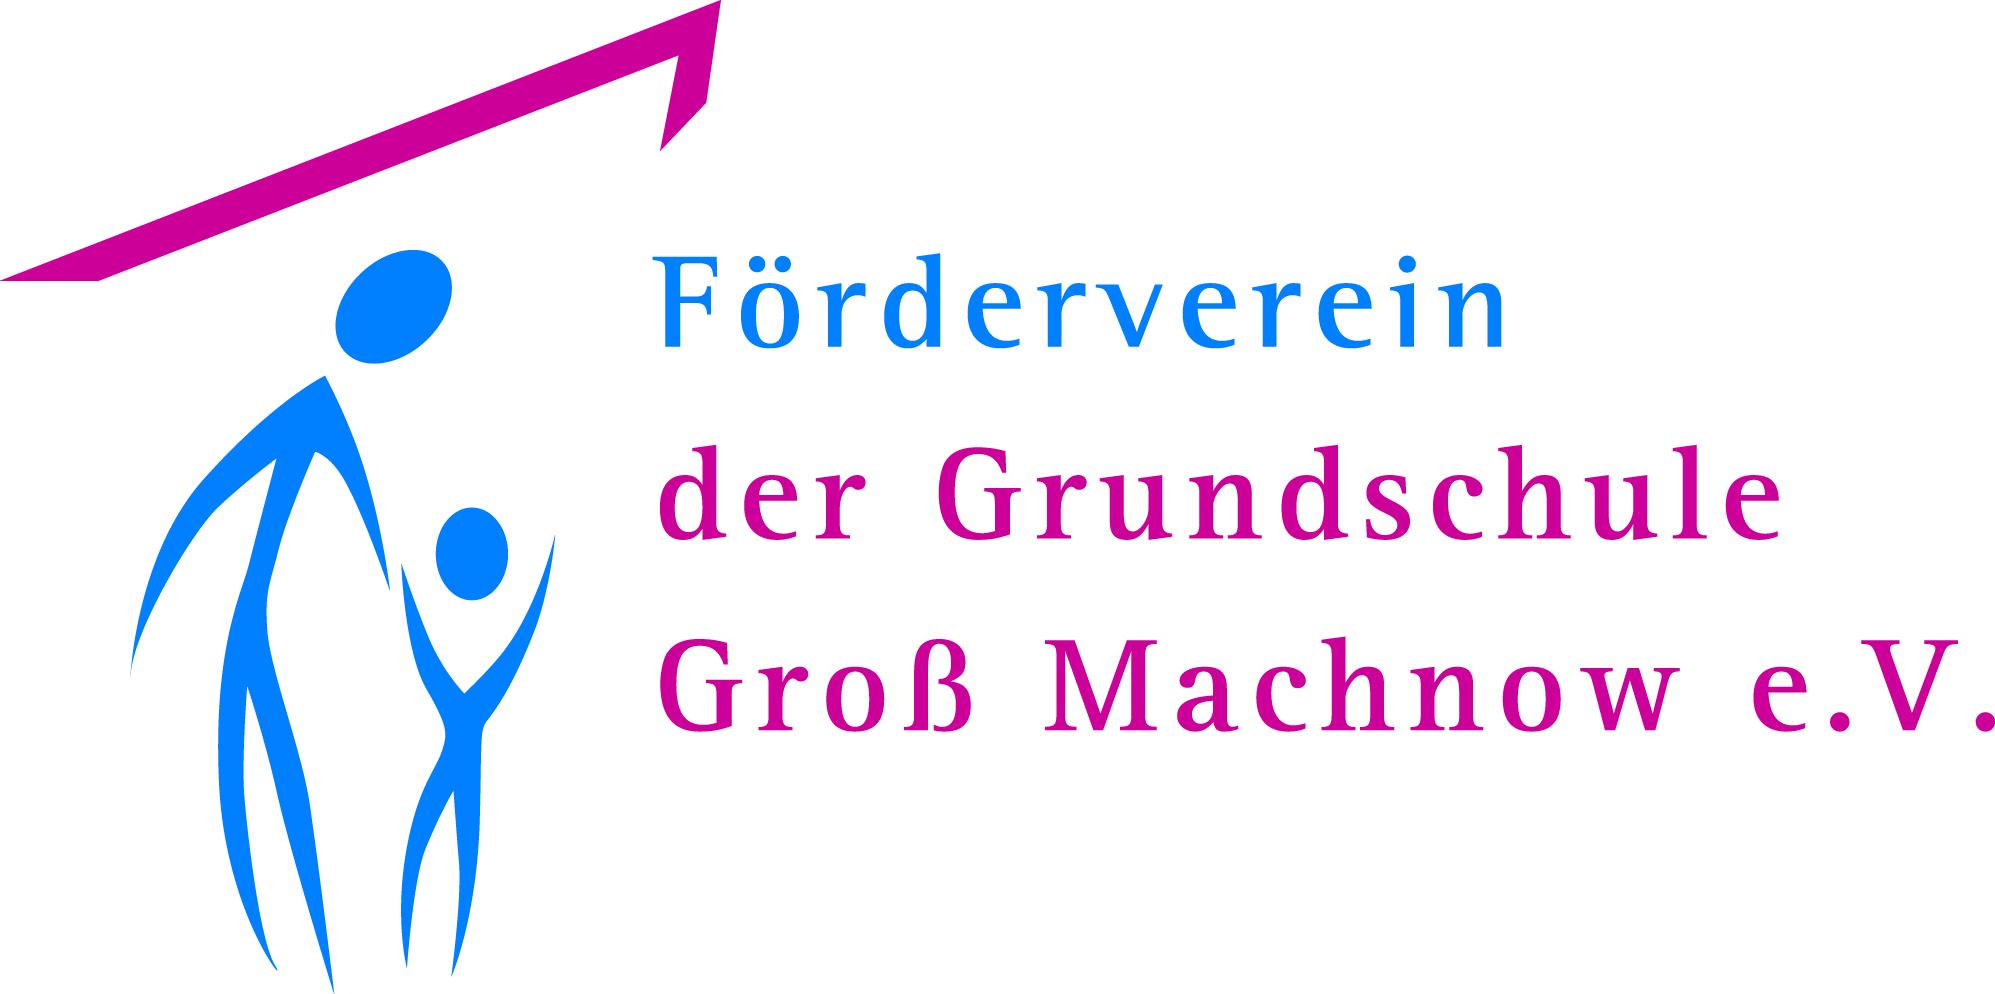 Förderverein der Grundschule Groß Machnow e. V.